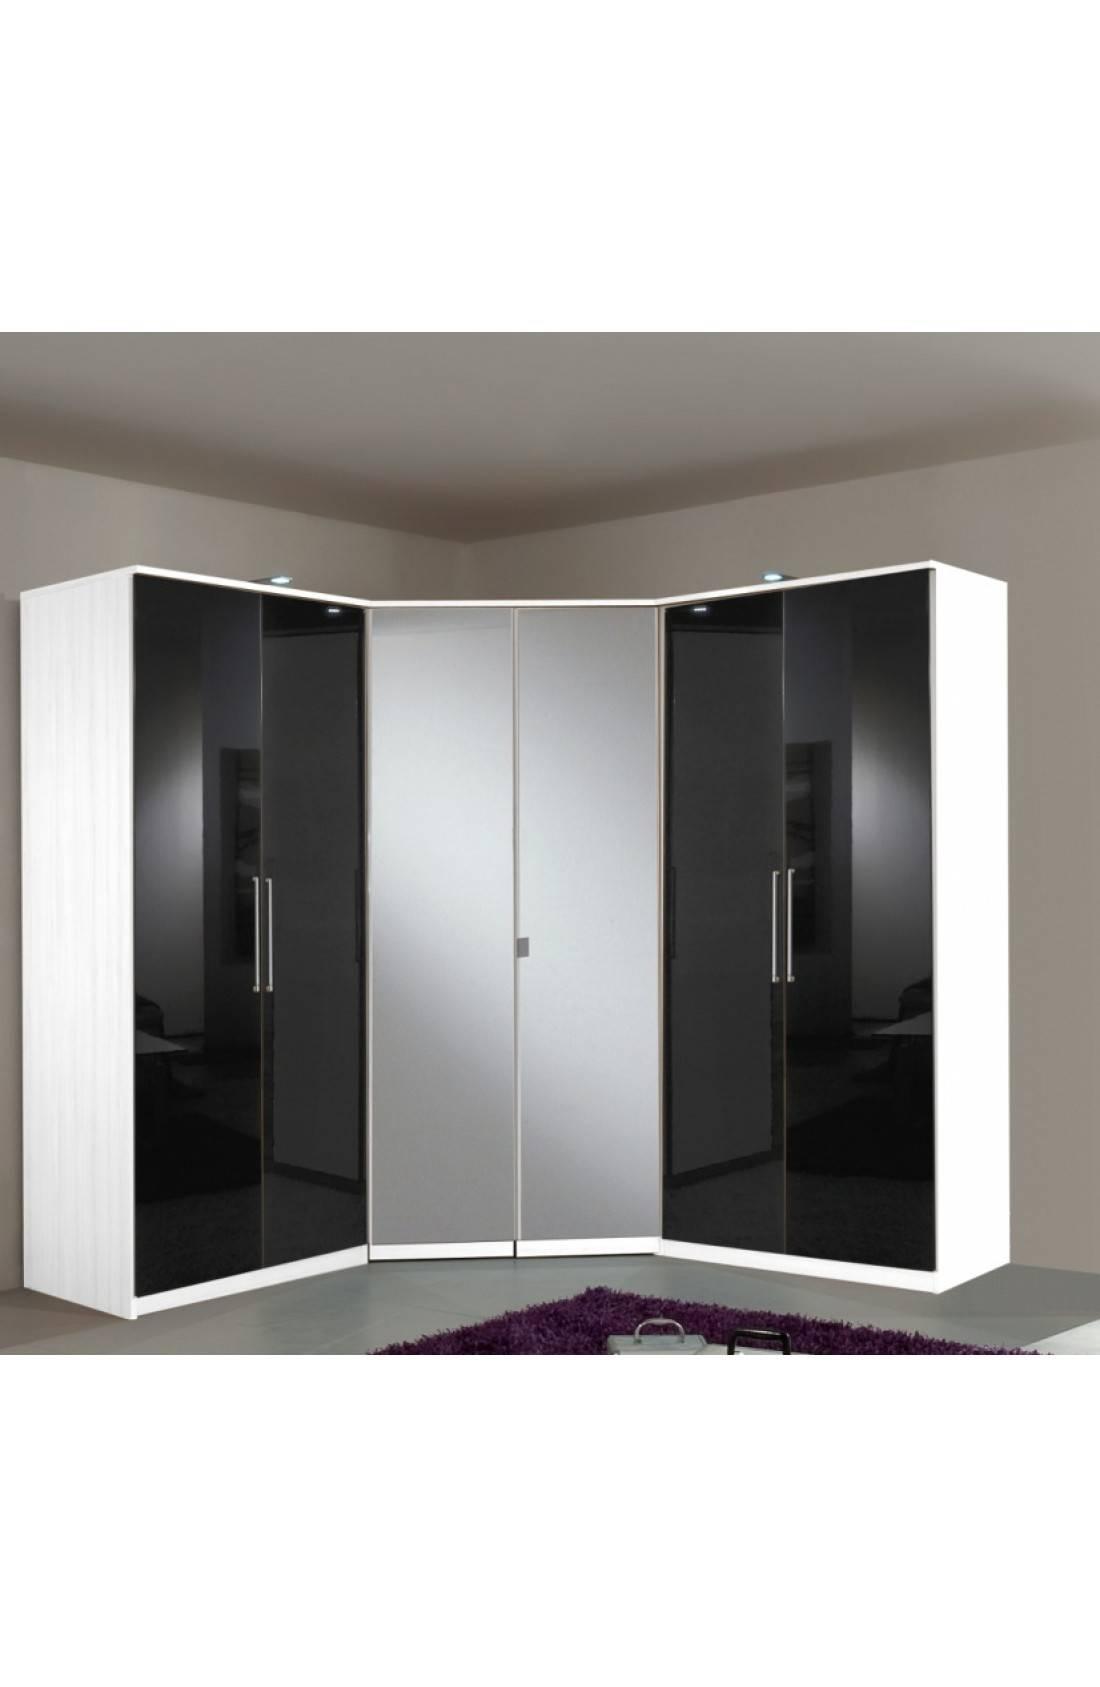 Slumberhaus 'gamma' 6 Door Corner Wardrobe Fitment With White In Corner Mirrored Wardrobes (View 9 of 15)